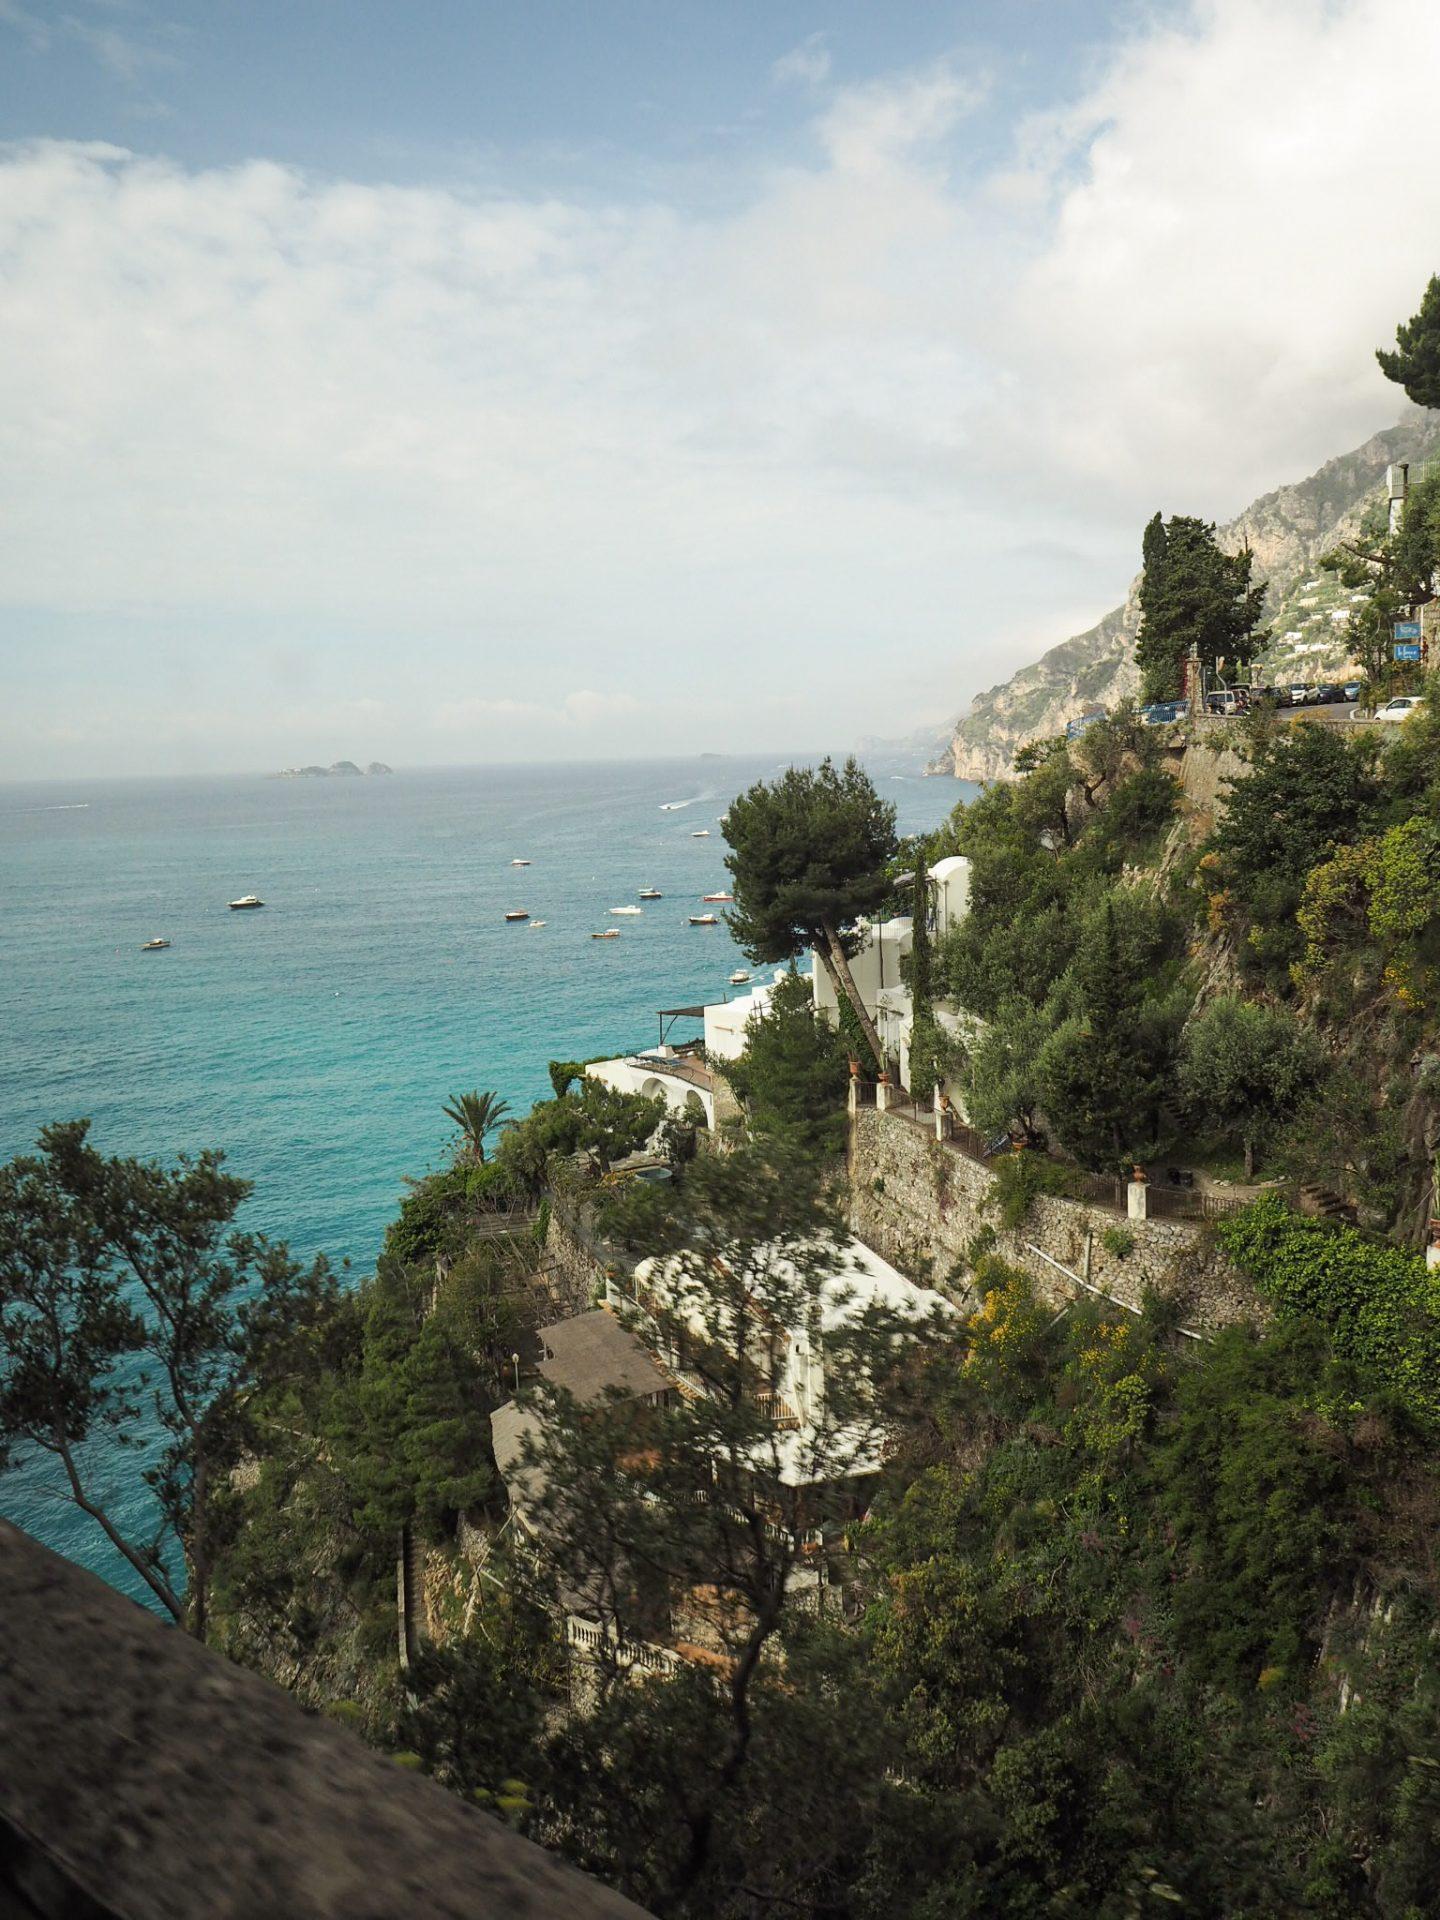 Sorrento travel: Positano